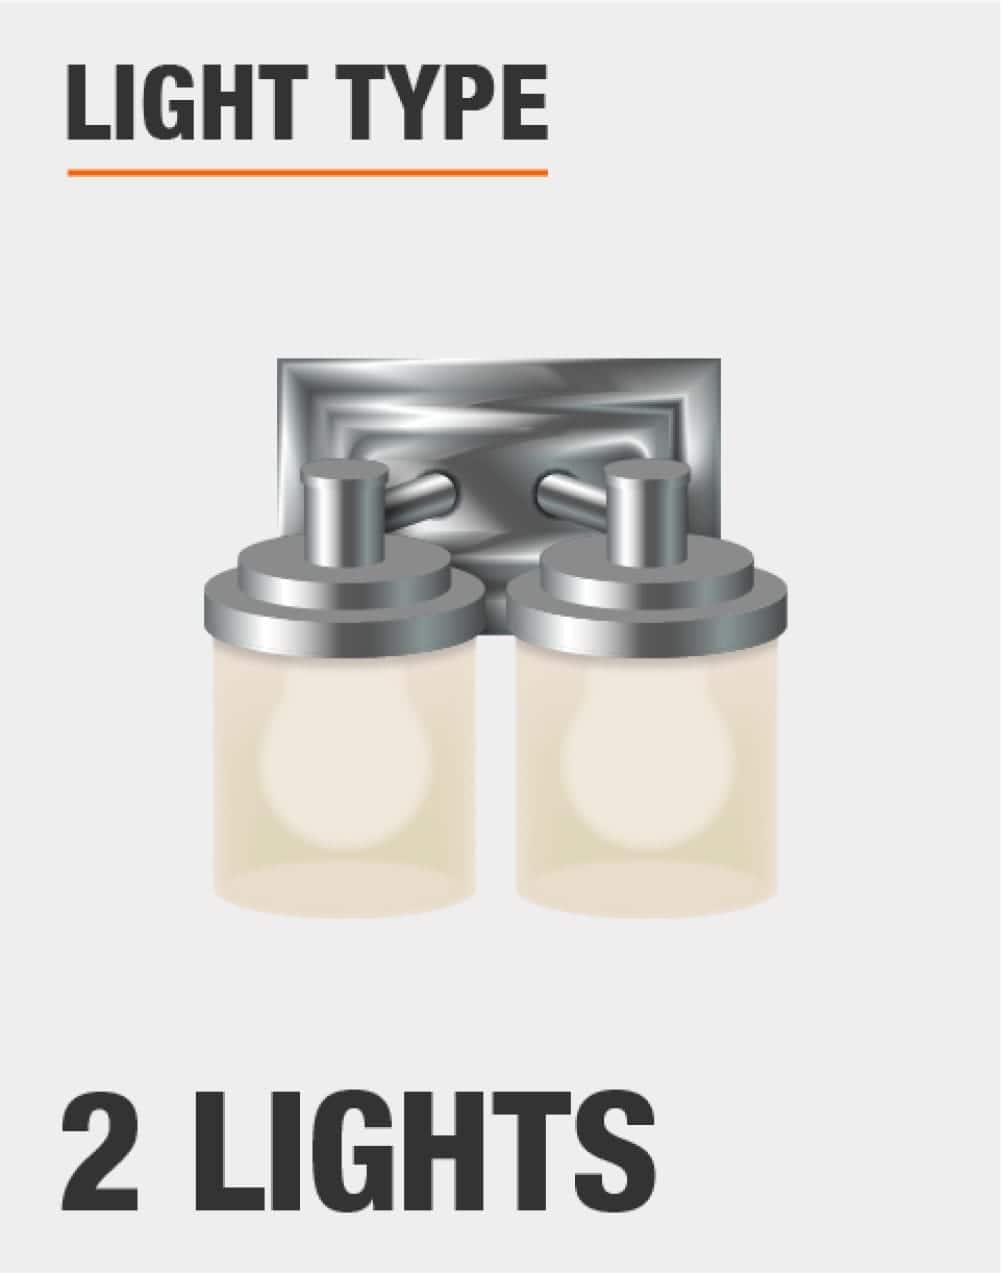 fixture has two lights